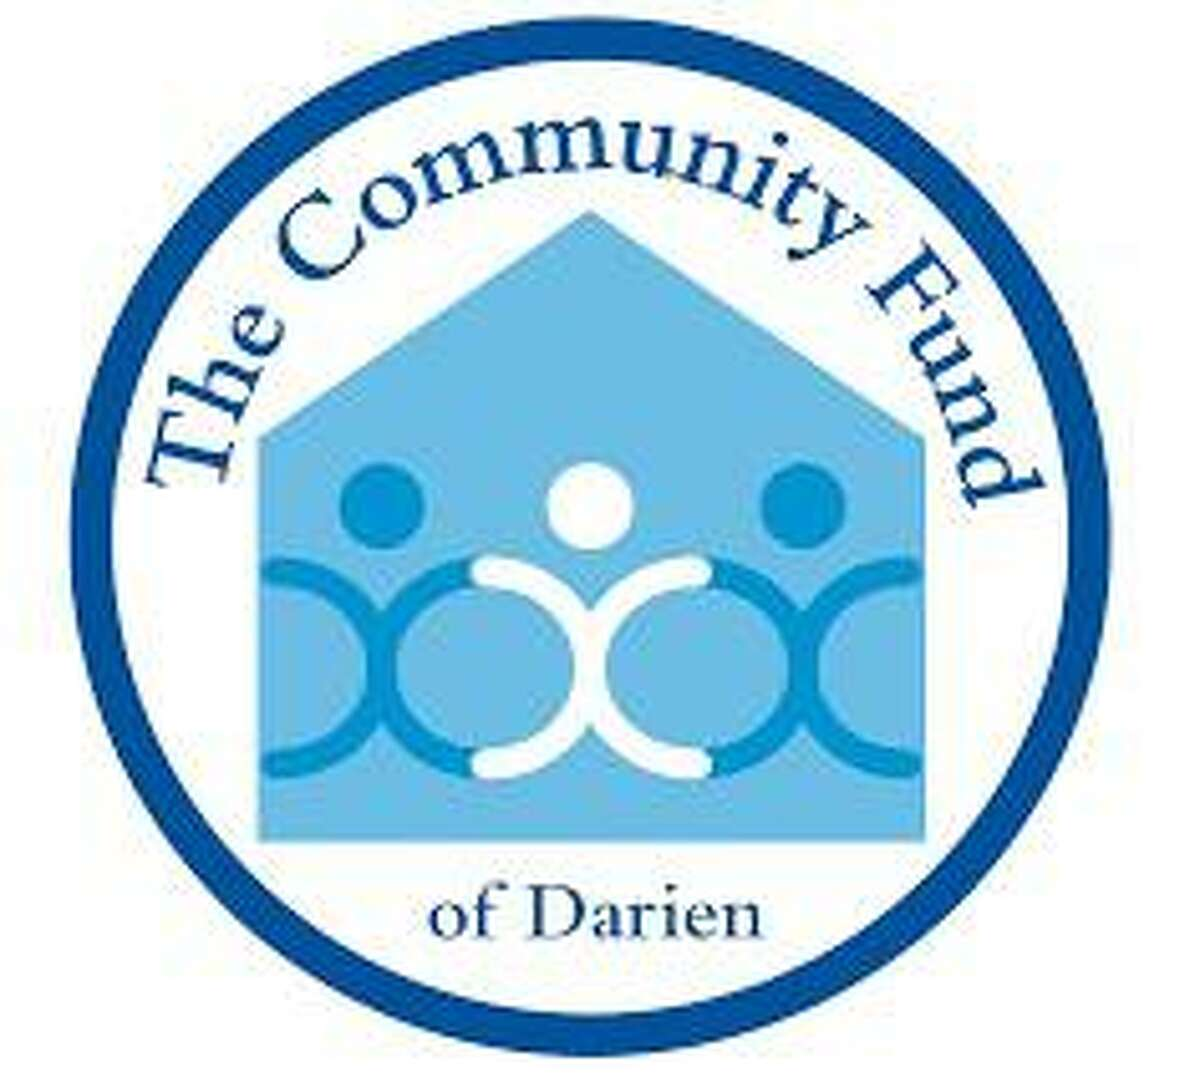 Community Fund of Darien